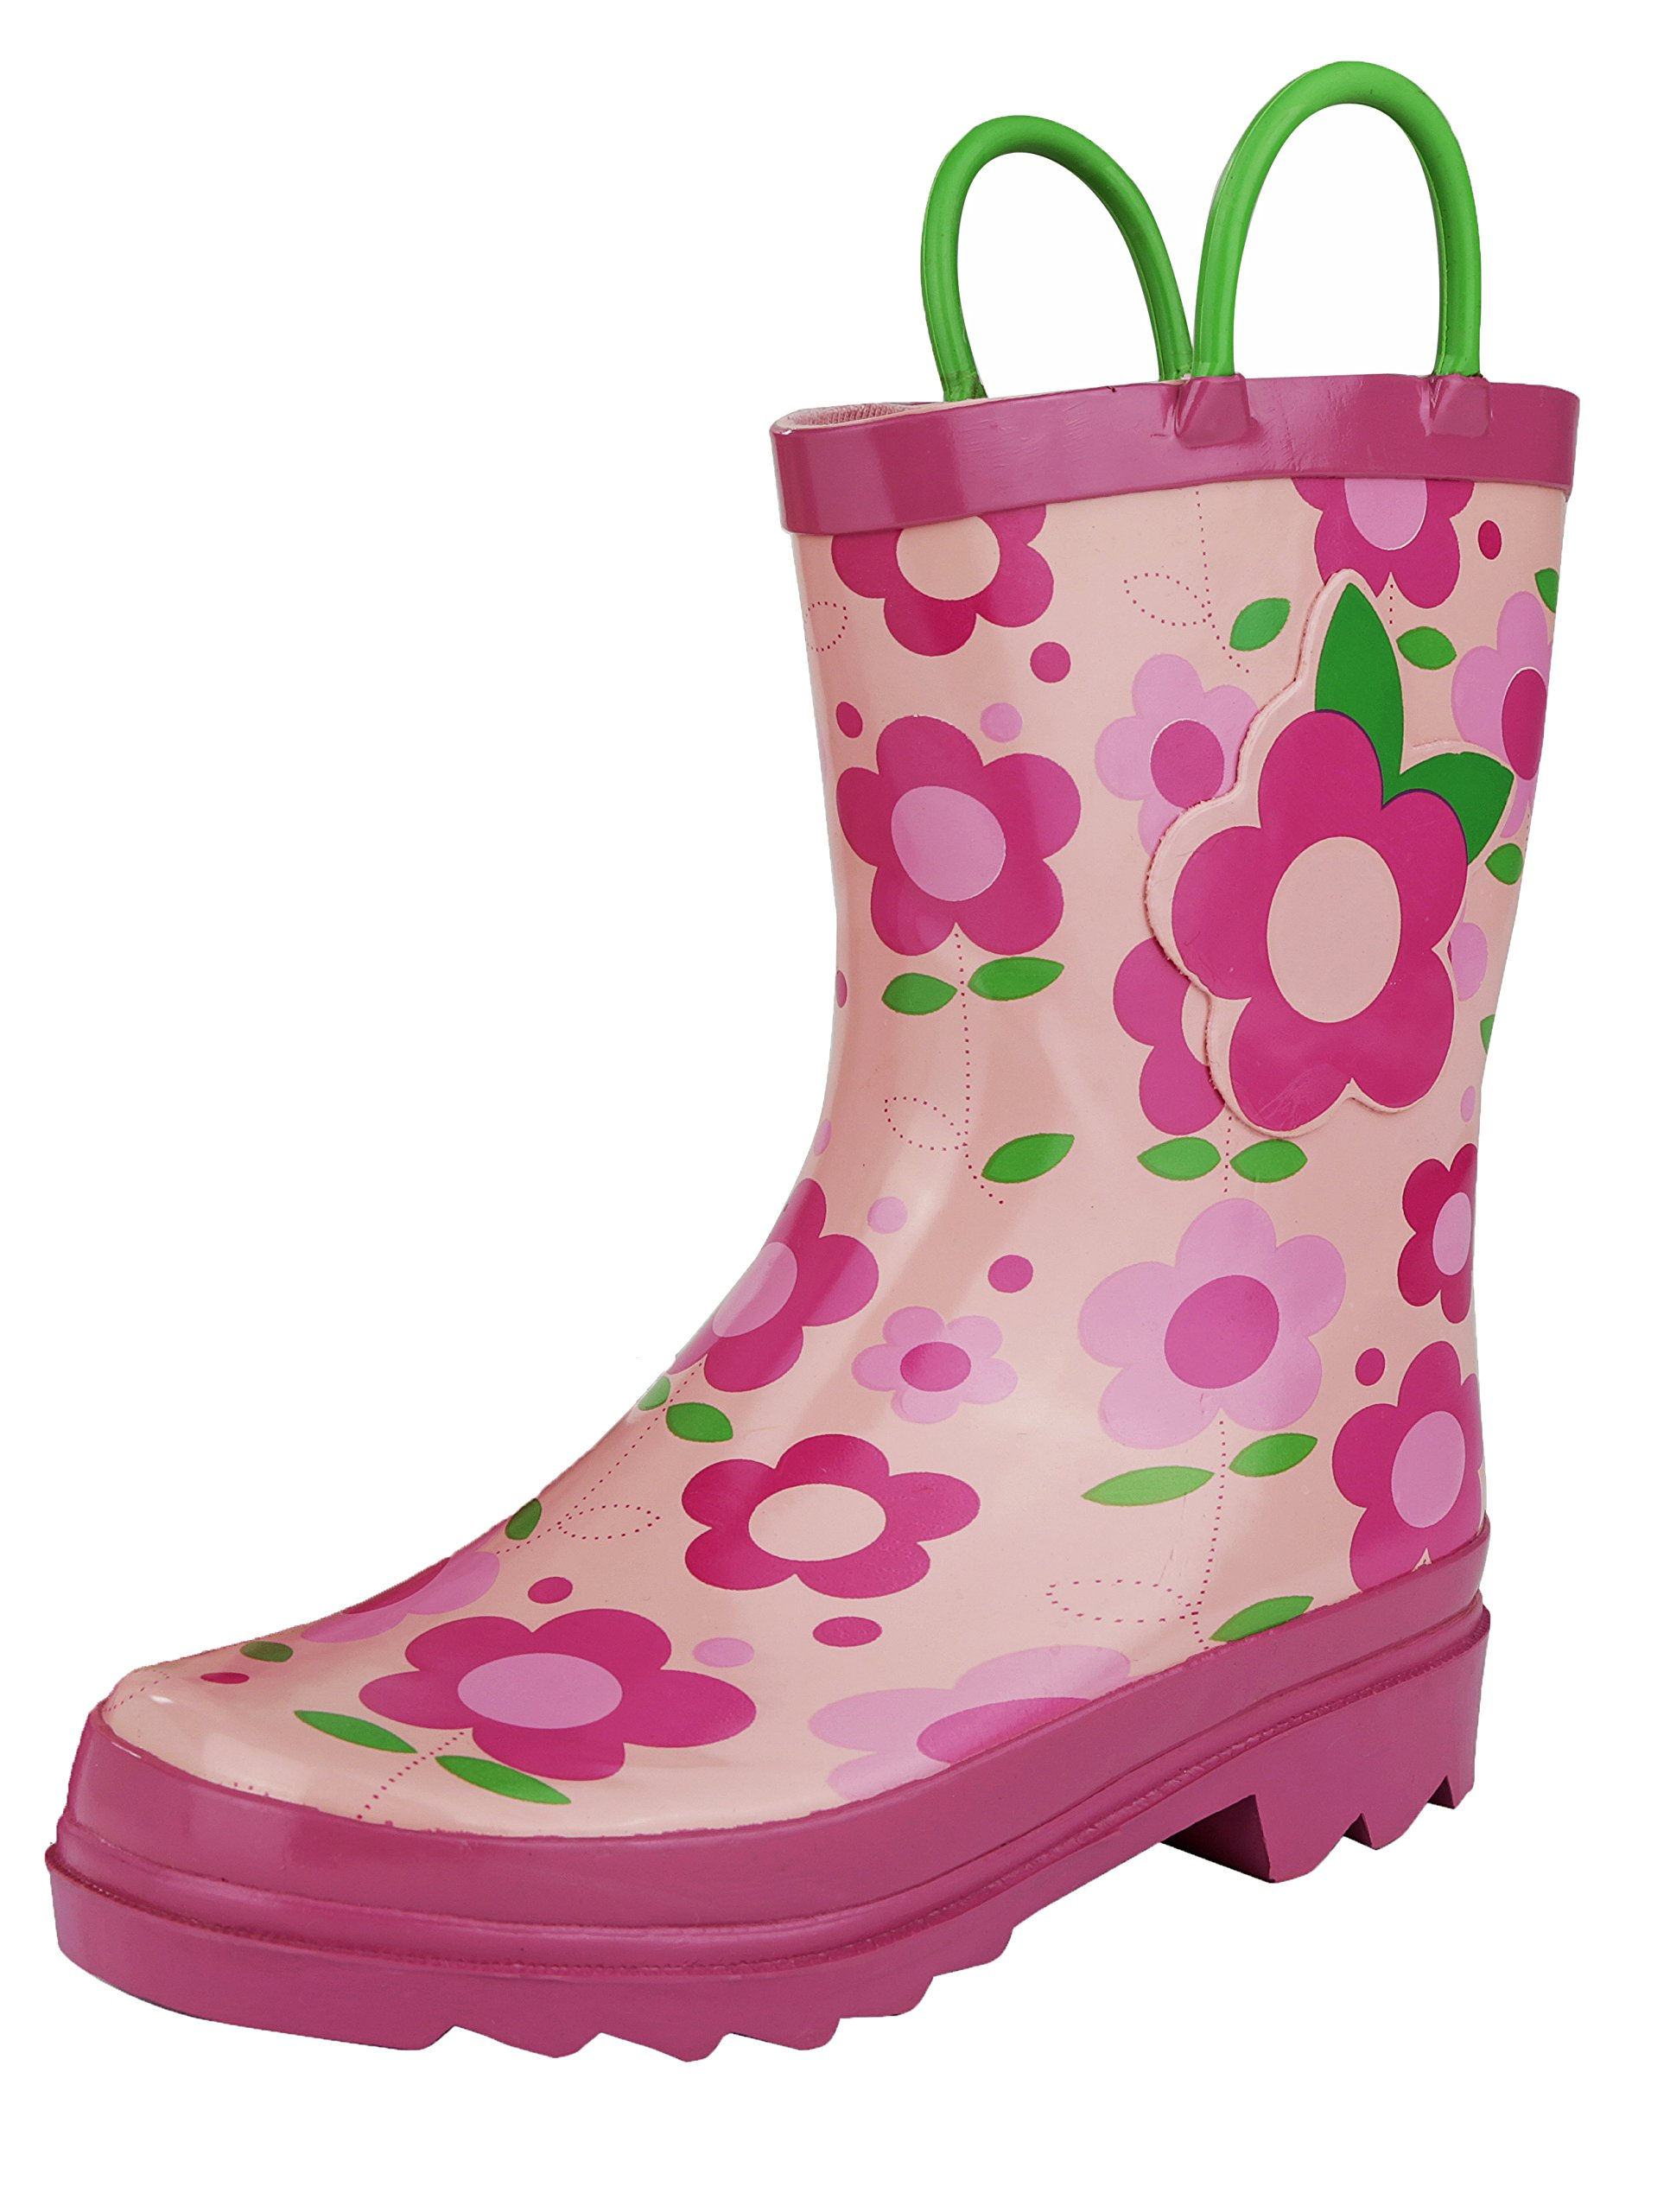 Little Girl's Pink Flower Rain Boots Sizes 11/12